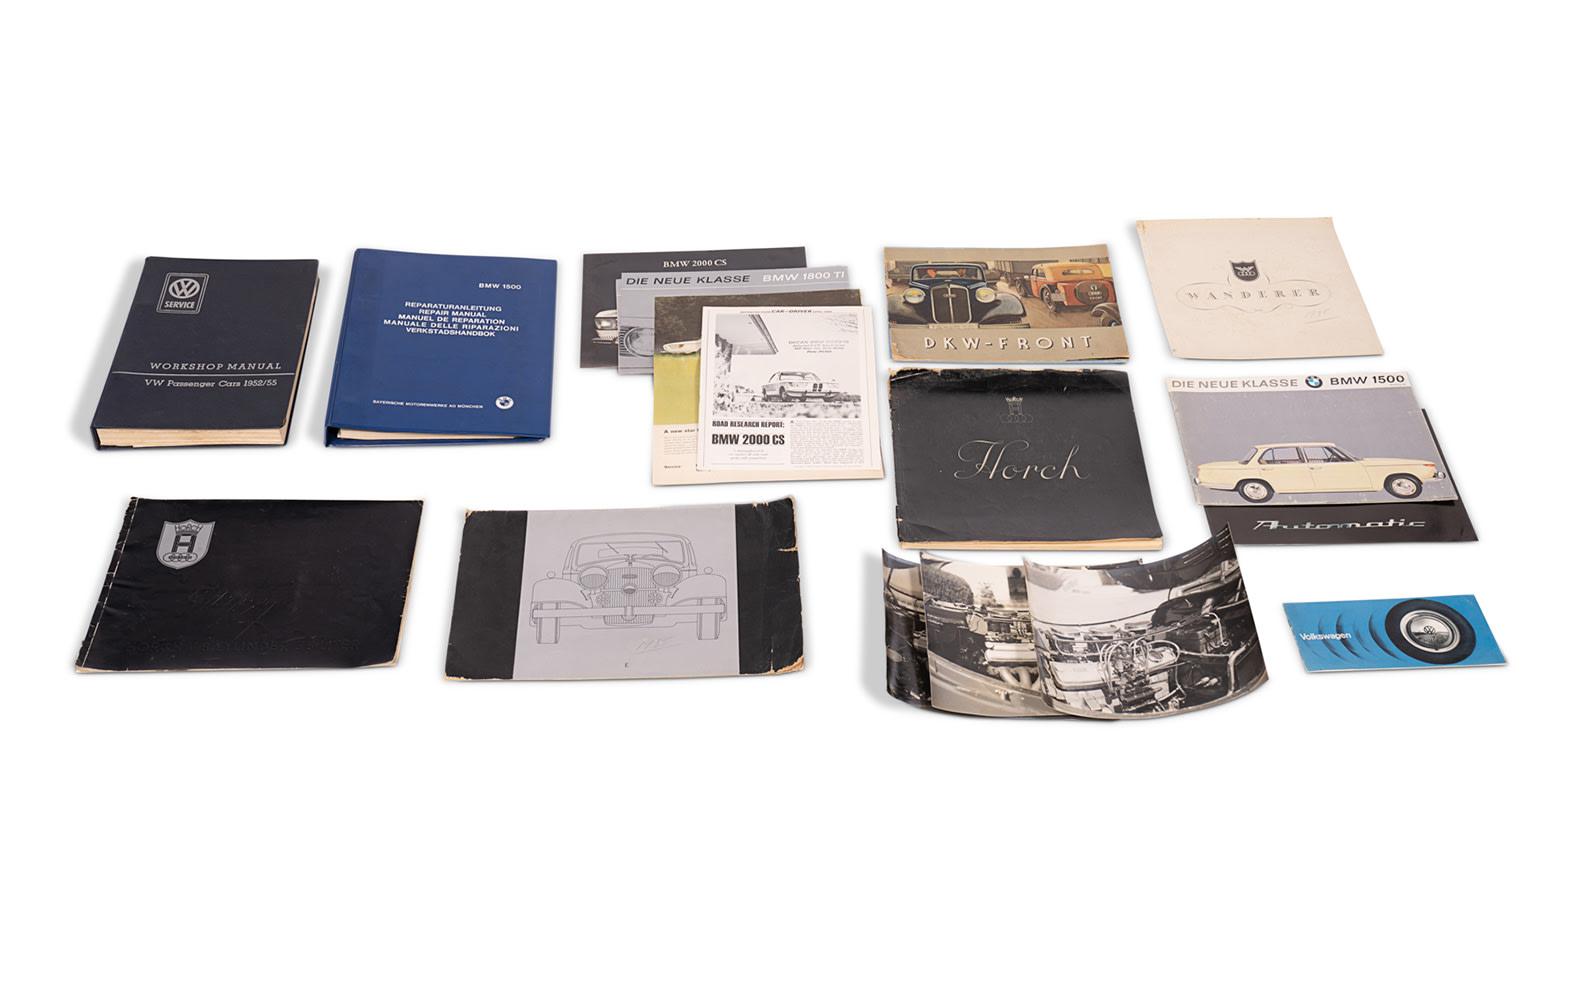 Assorted Literature on BMW, DKW, and Volkswagen